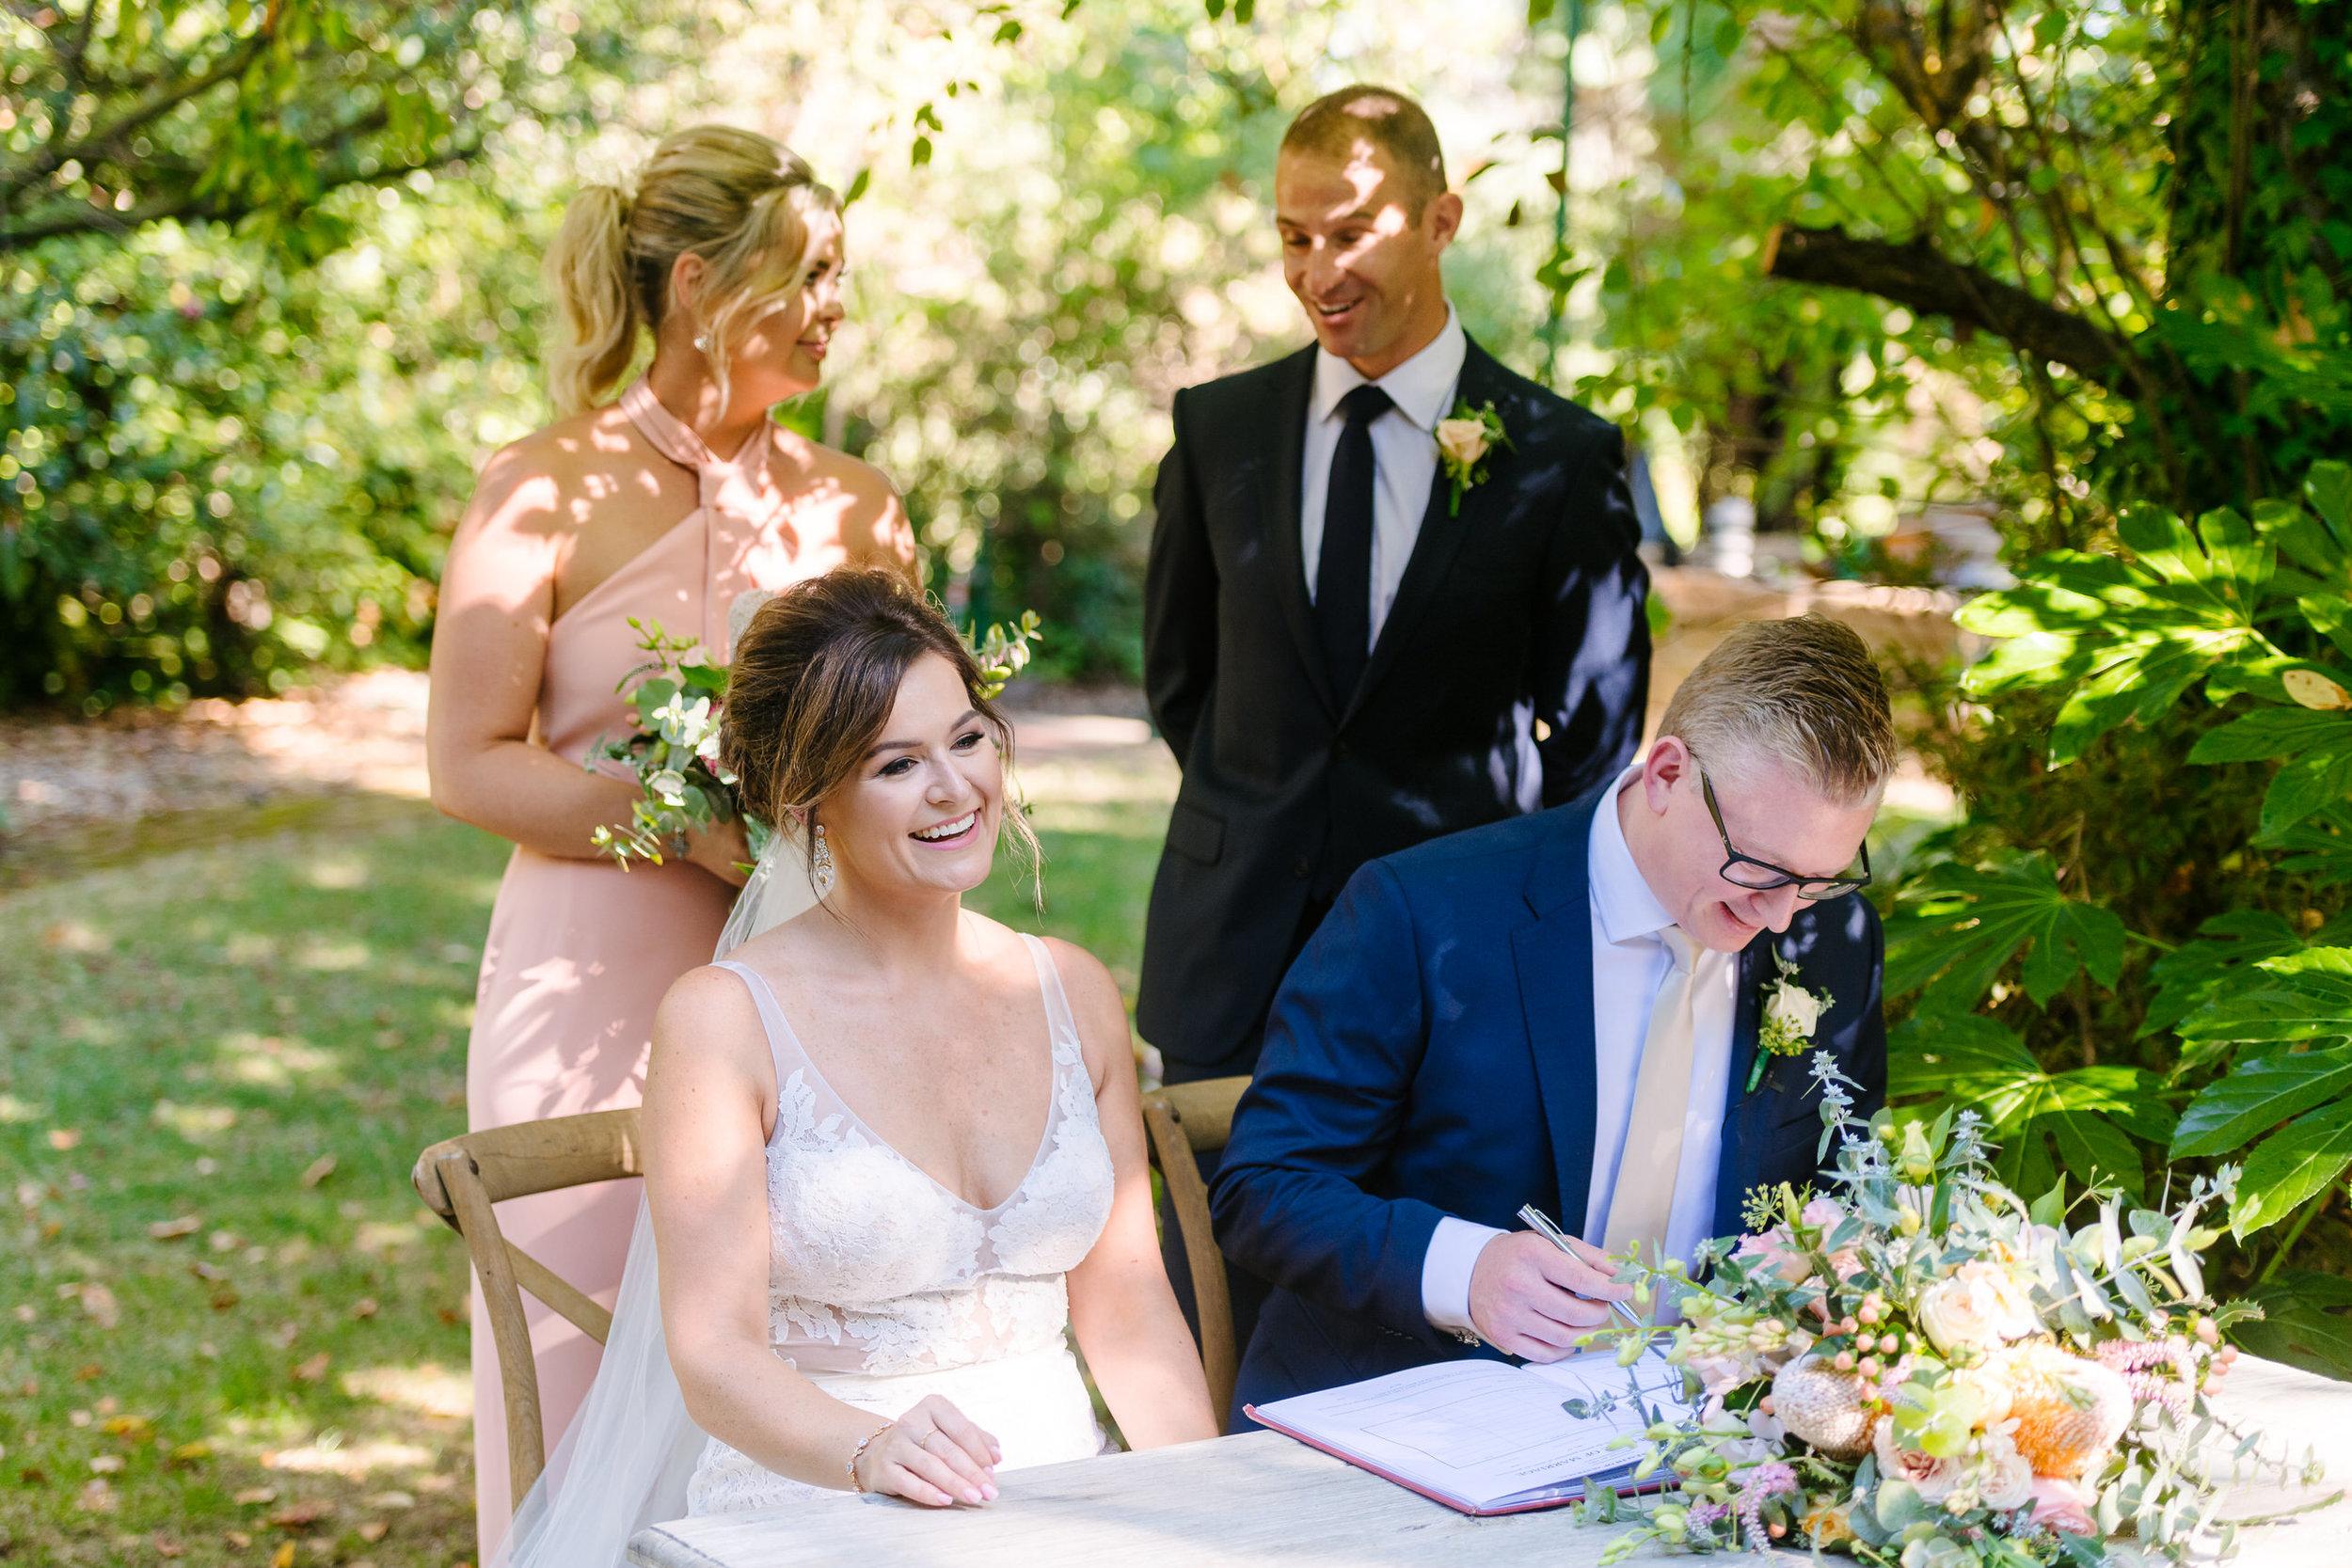 Justin_And_Jim_Photography_Chateau_Dore_Bendigo_Wedding44.JPG